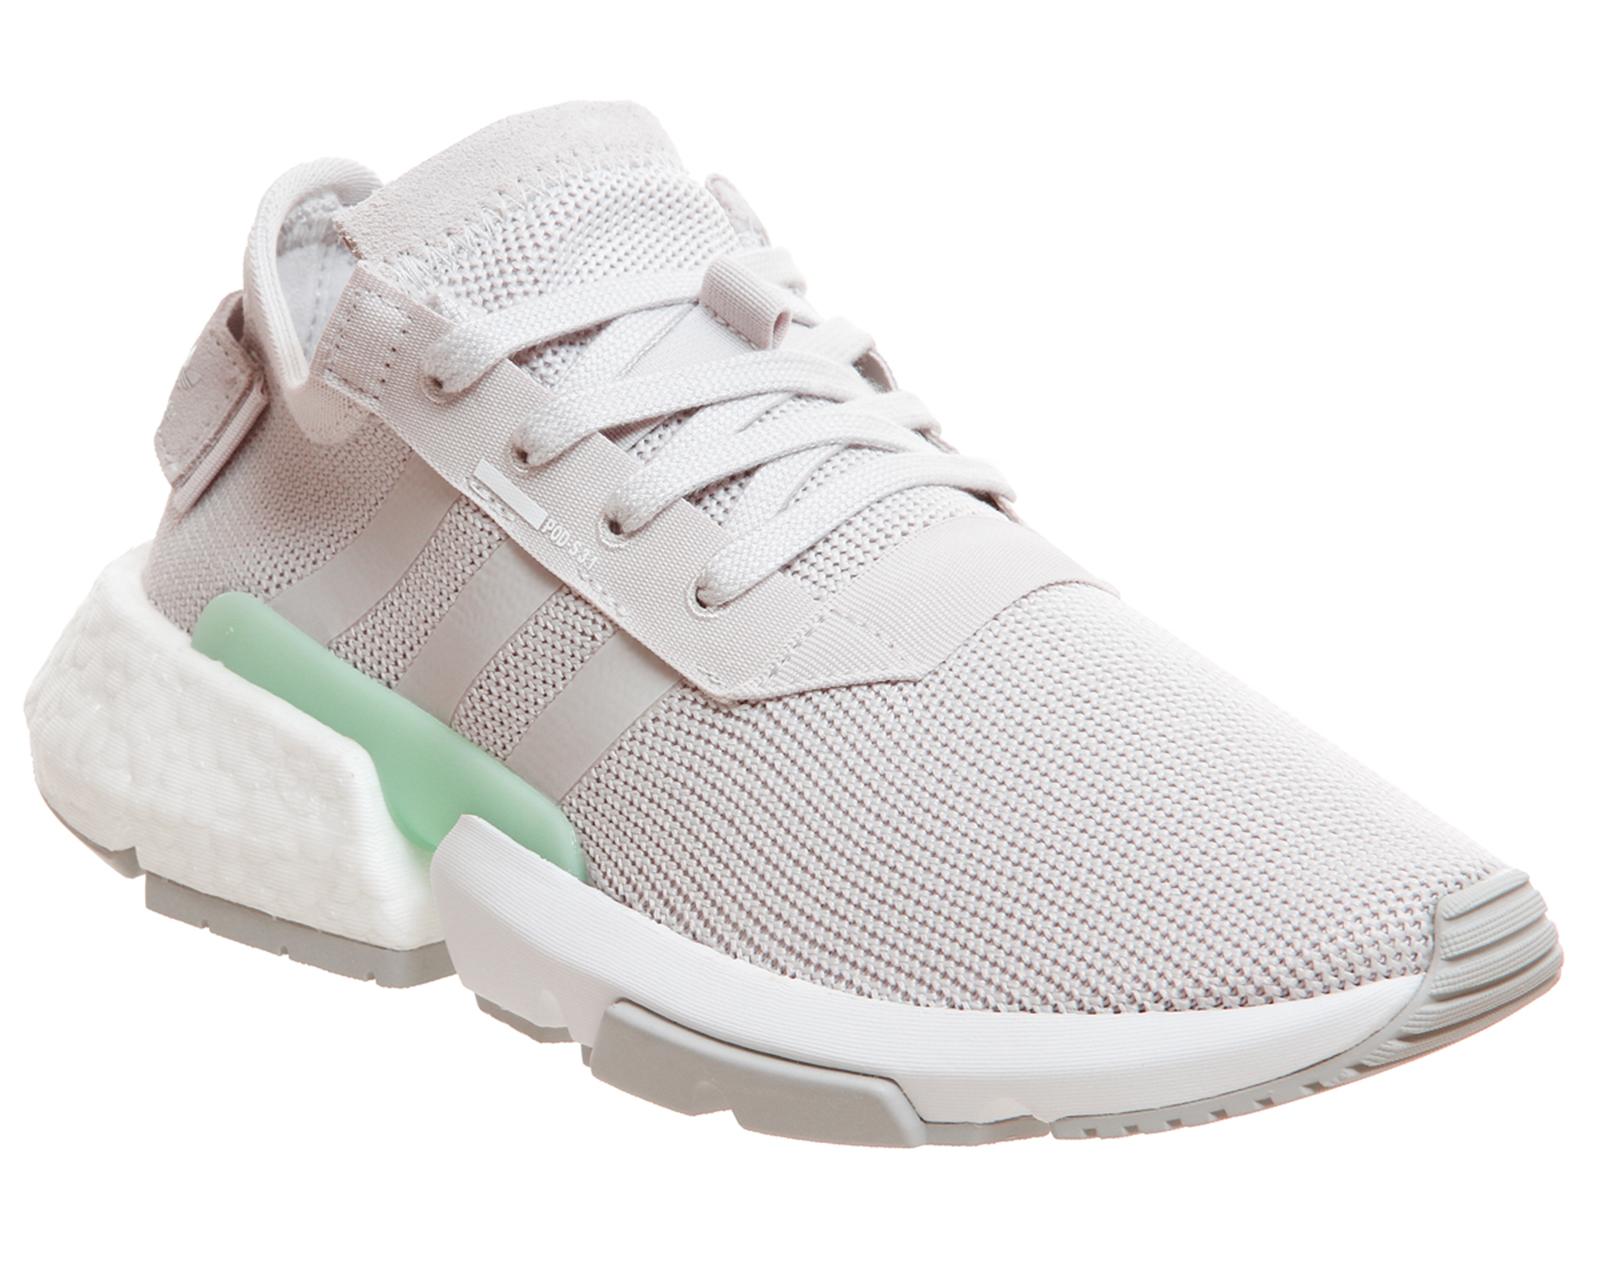 SENTINEL Adidas Pod S 3.1 allenatori grigio chiaro menta formatori scarpe b4729de92437